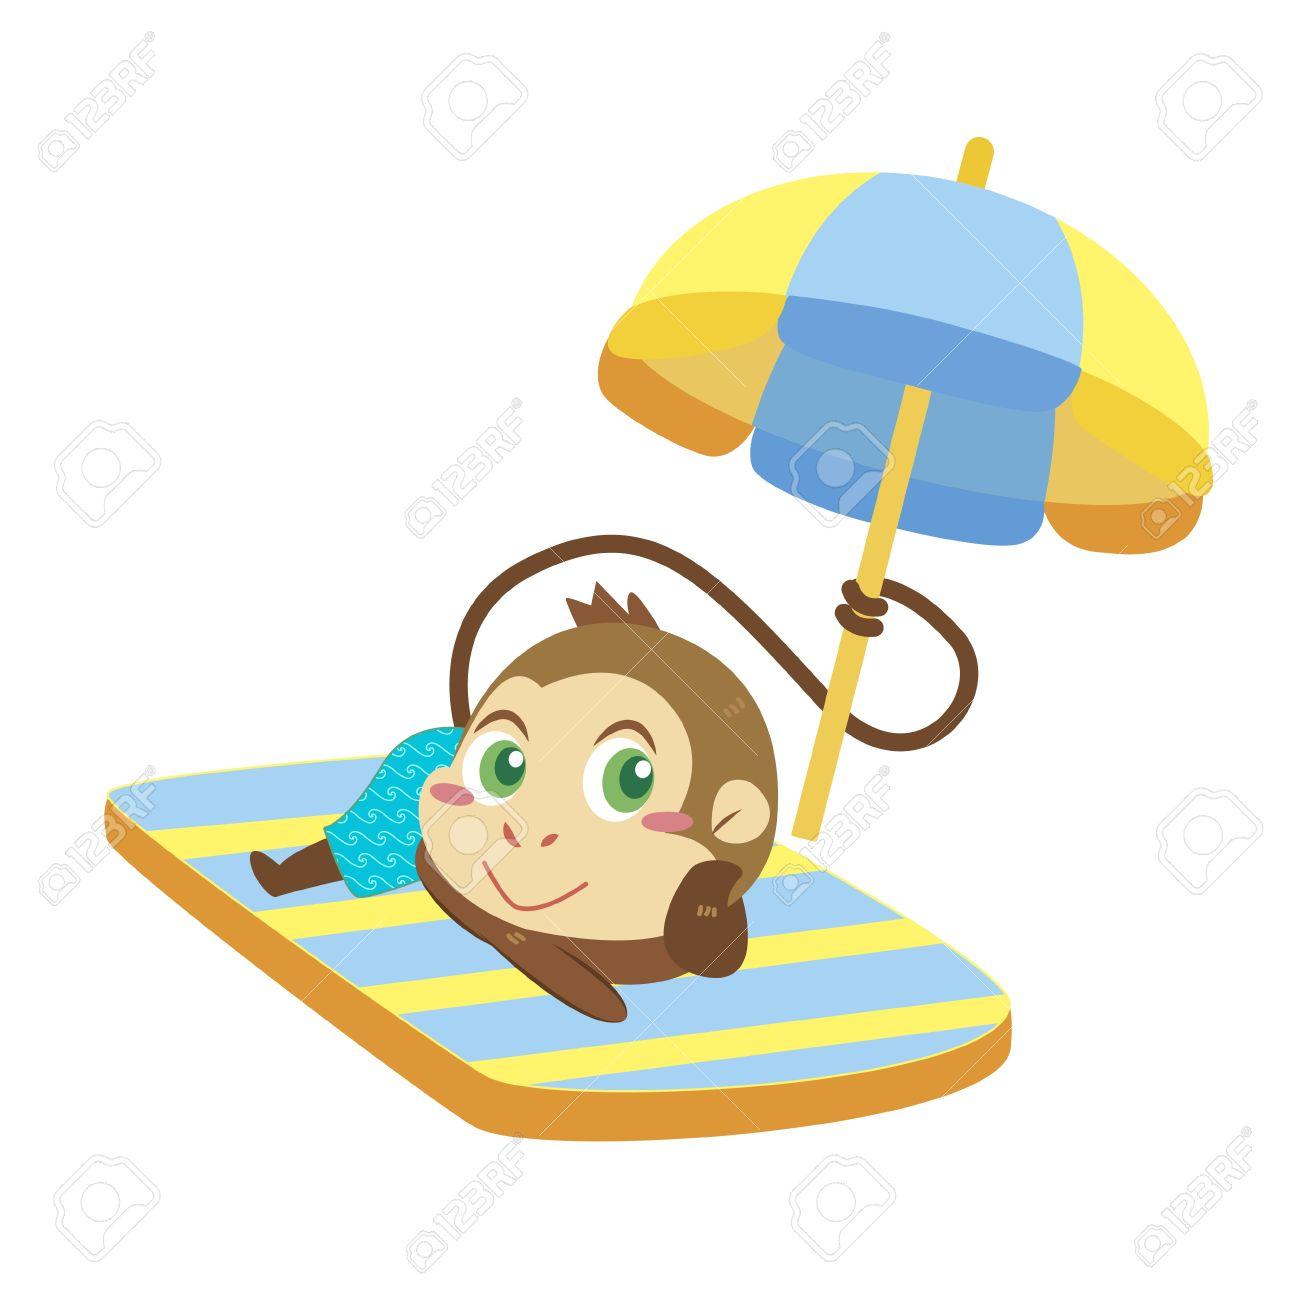 a cute monkey soak up a sunbathe Stock Vector - 17134588